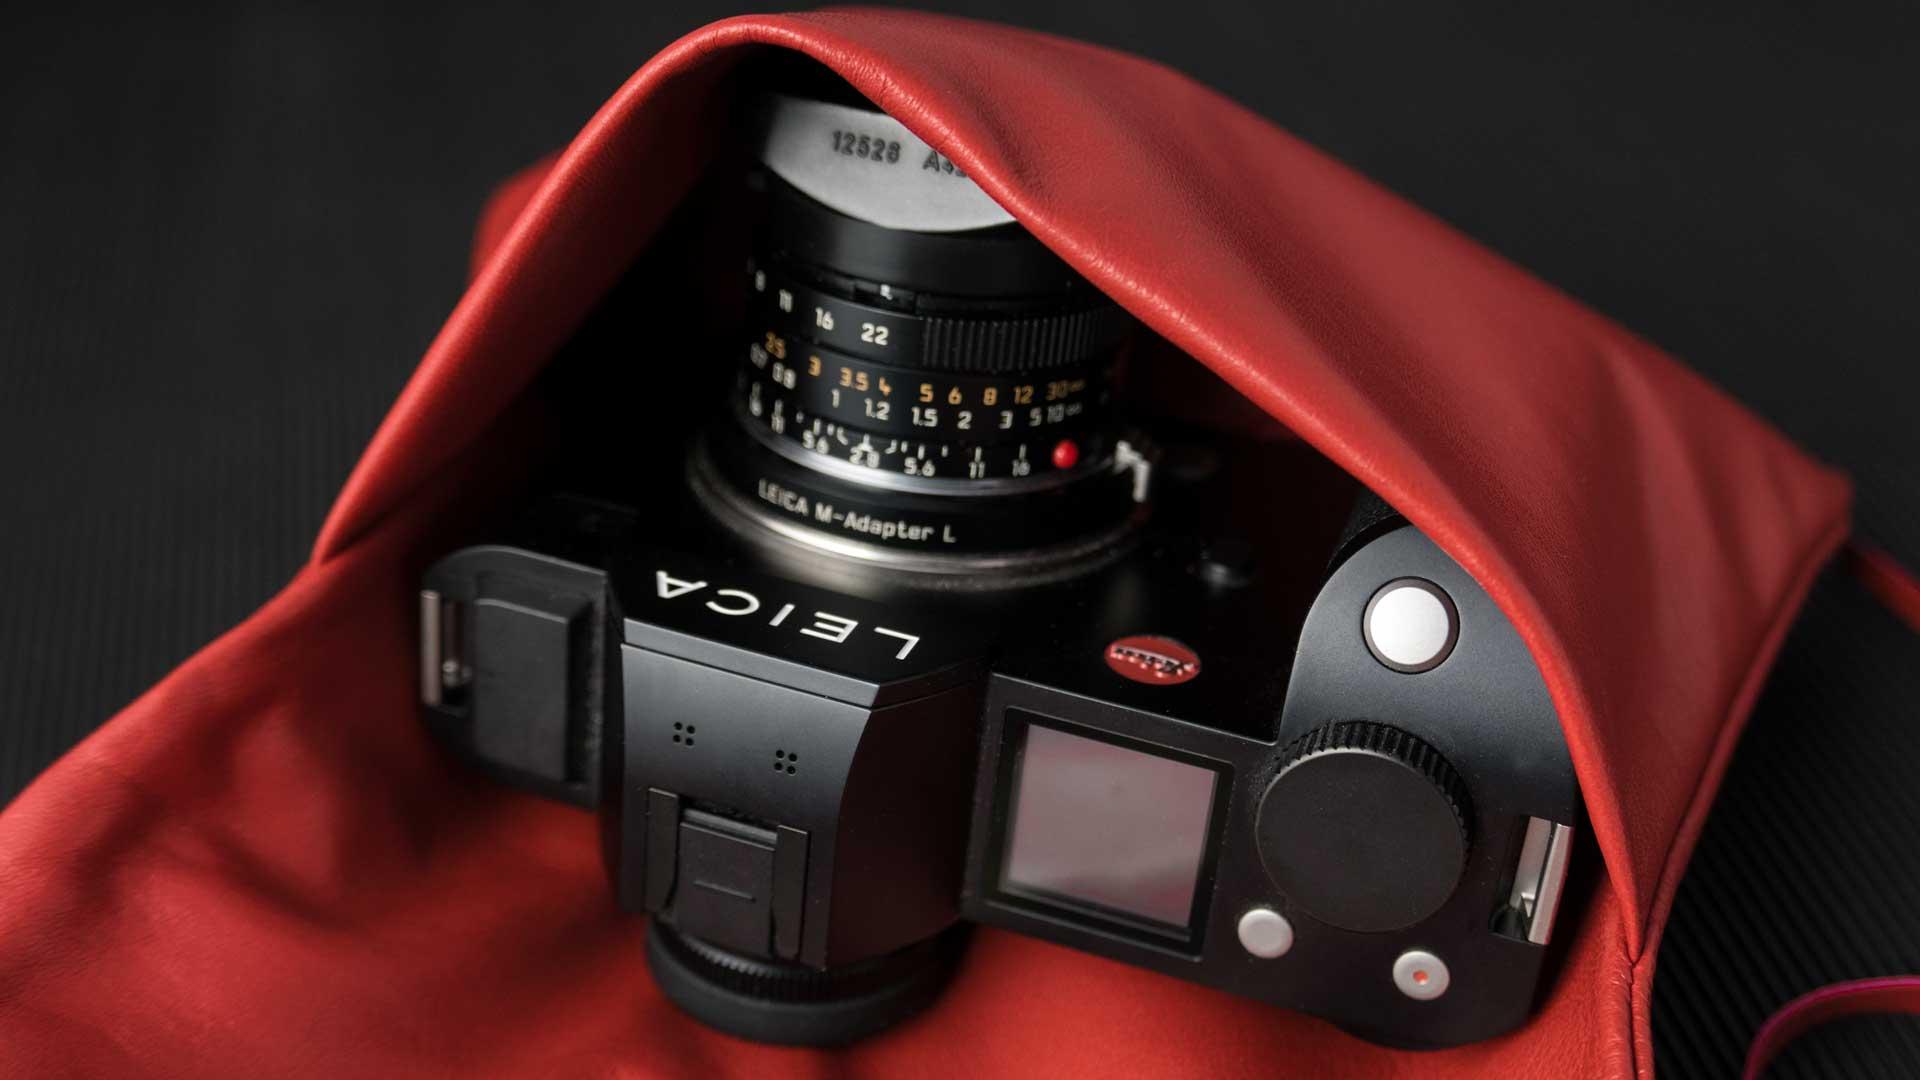 camera pouch